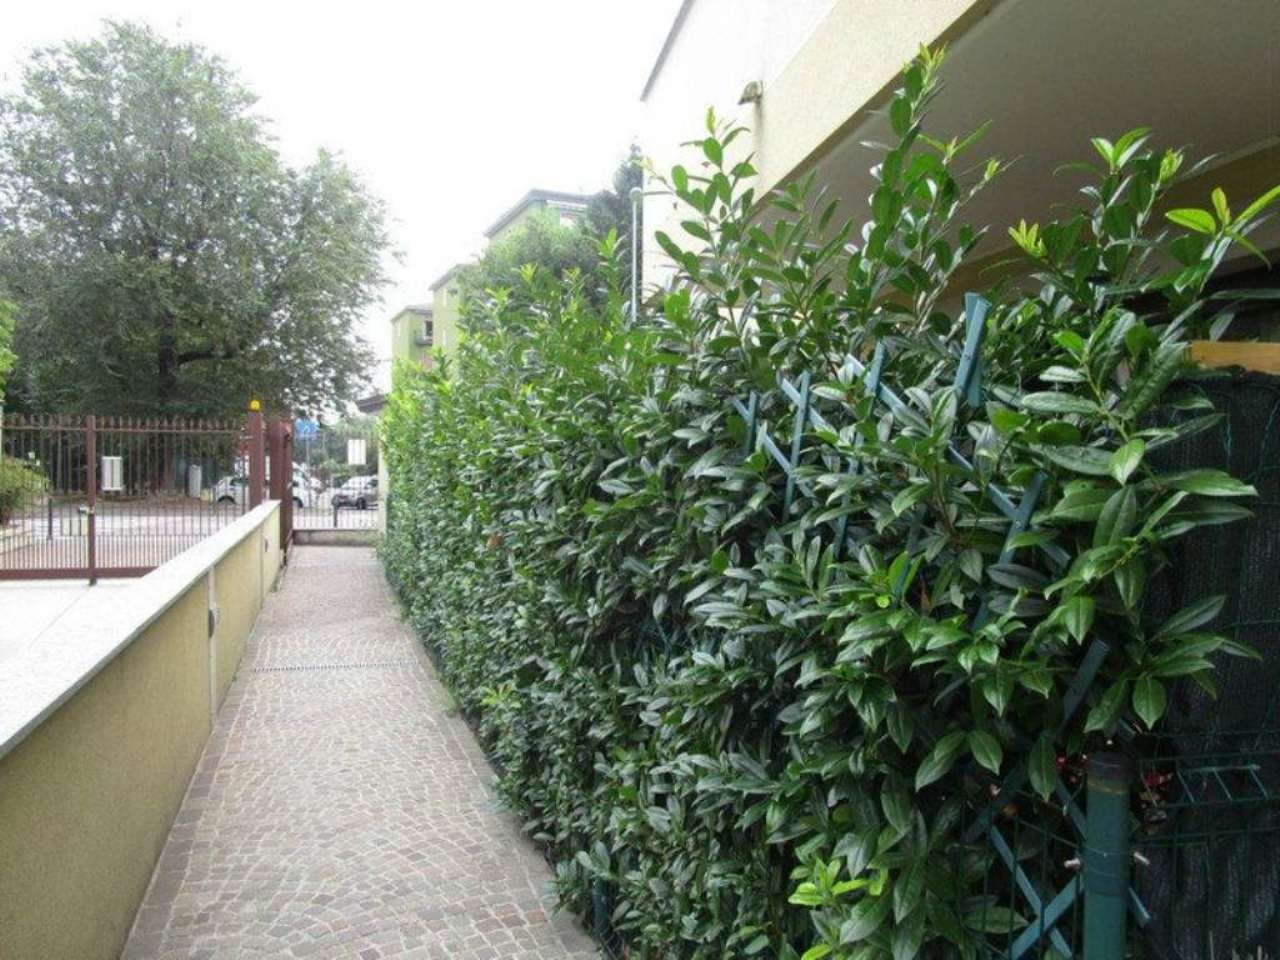 Bilocale Monza Via San Rocco 6